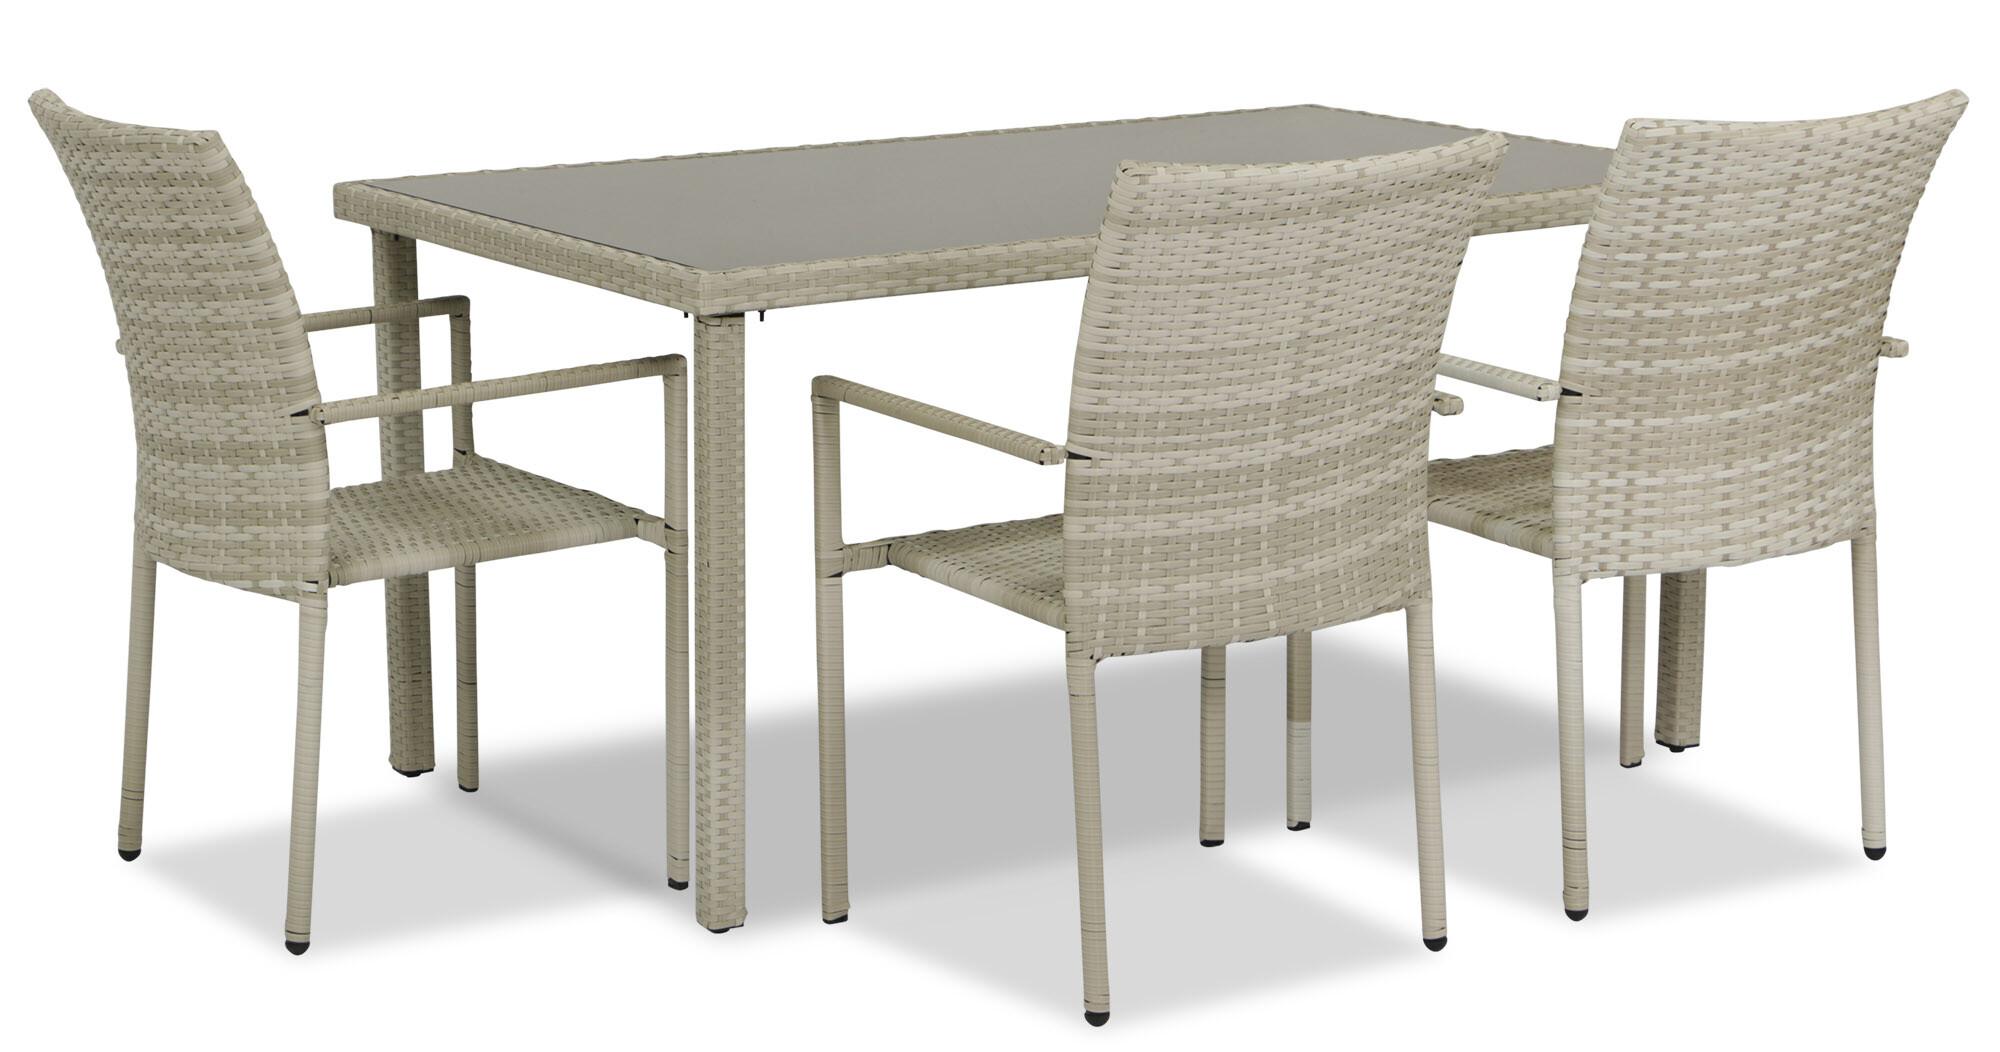 Wakiky Outdoor Dining Set 1 4 Cream Furniture Home Decor